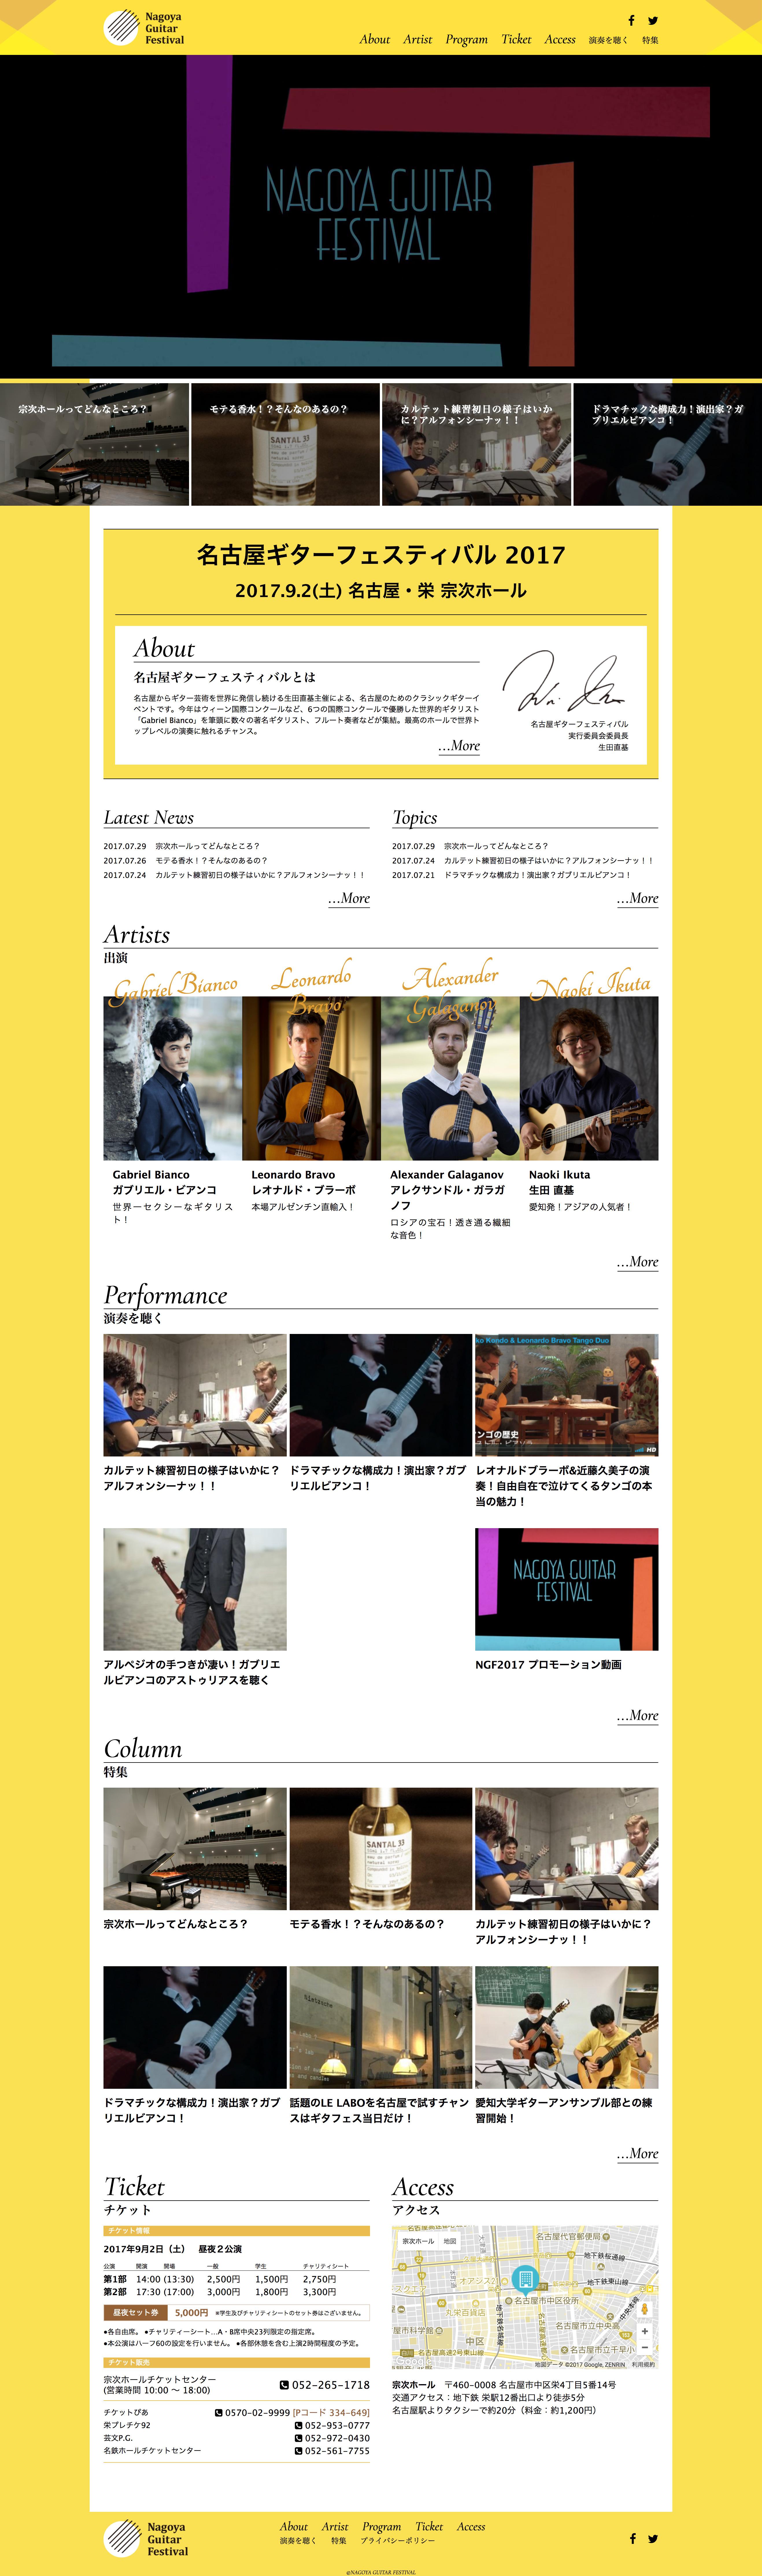 guitar-fes-nagoya.jpg